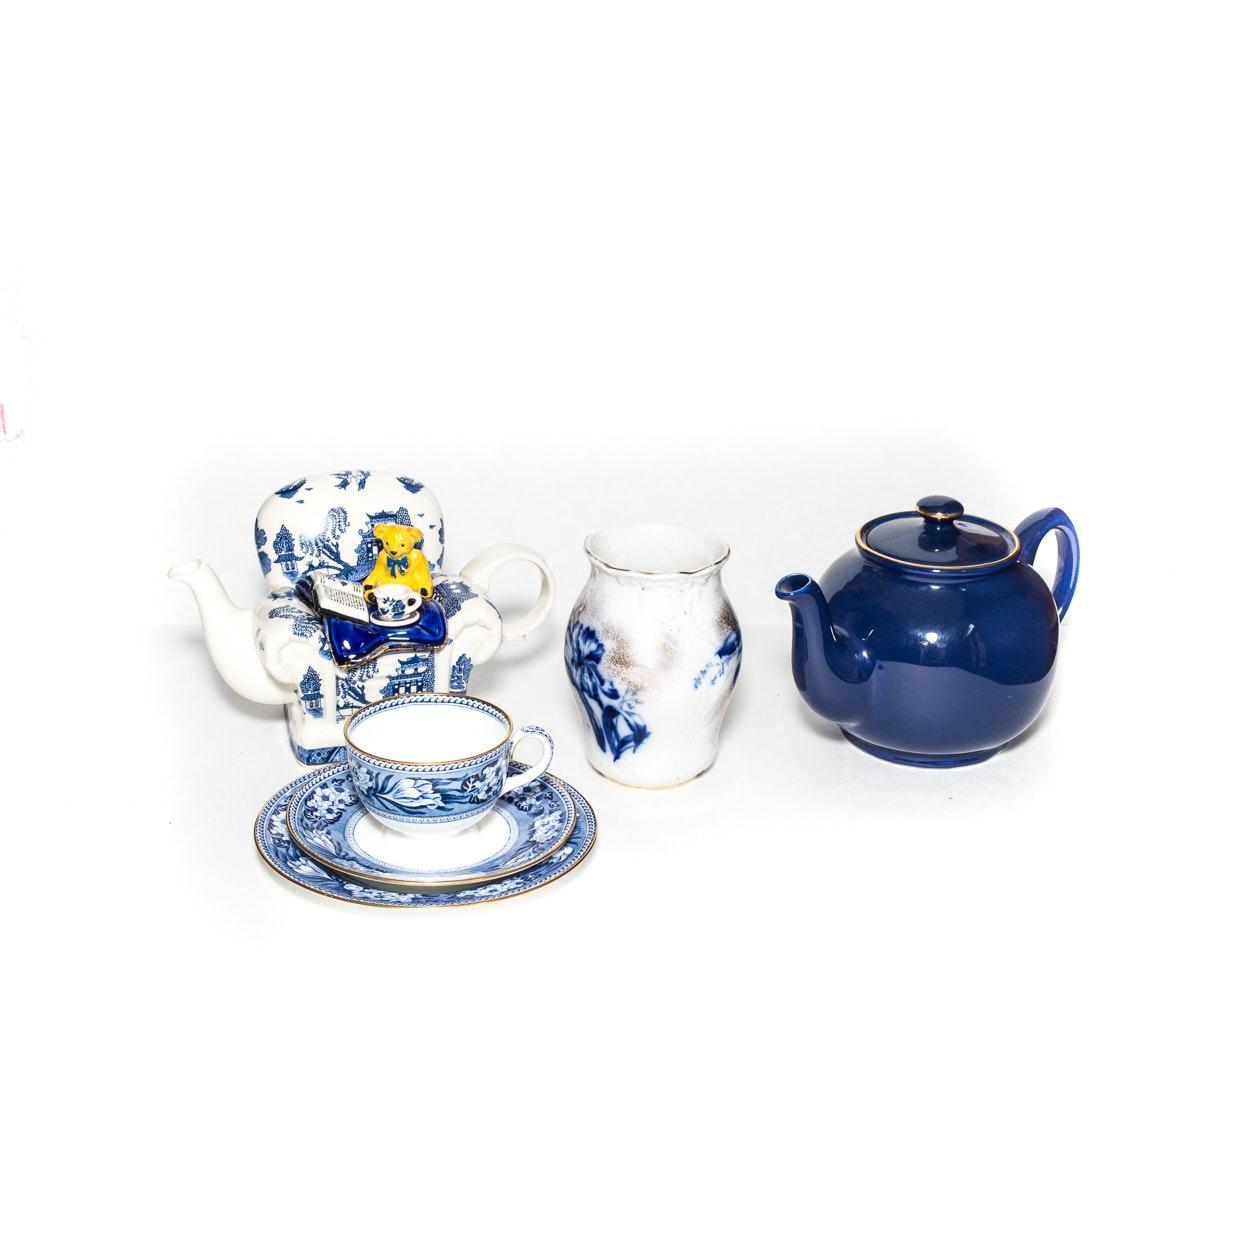 Serveware, Including Cardew Blue, Wedgwood, and Vintage S. Hancock & Sons Vase